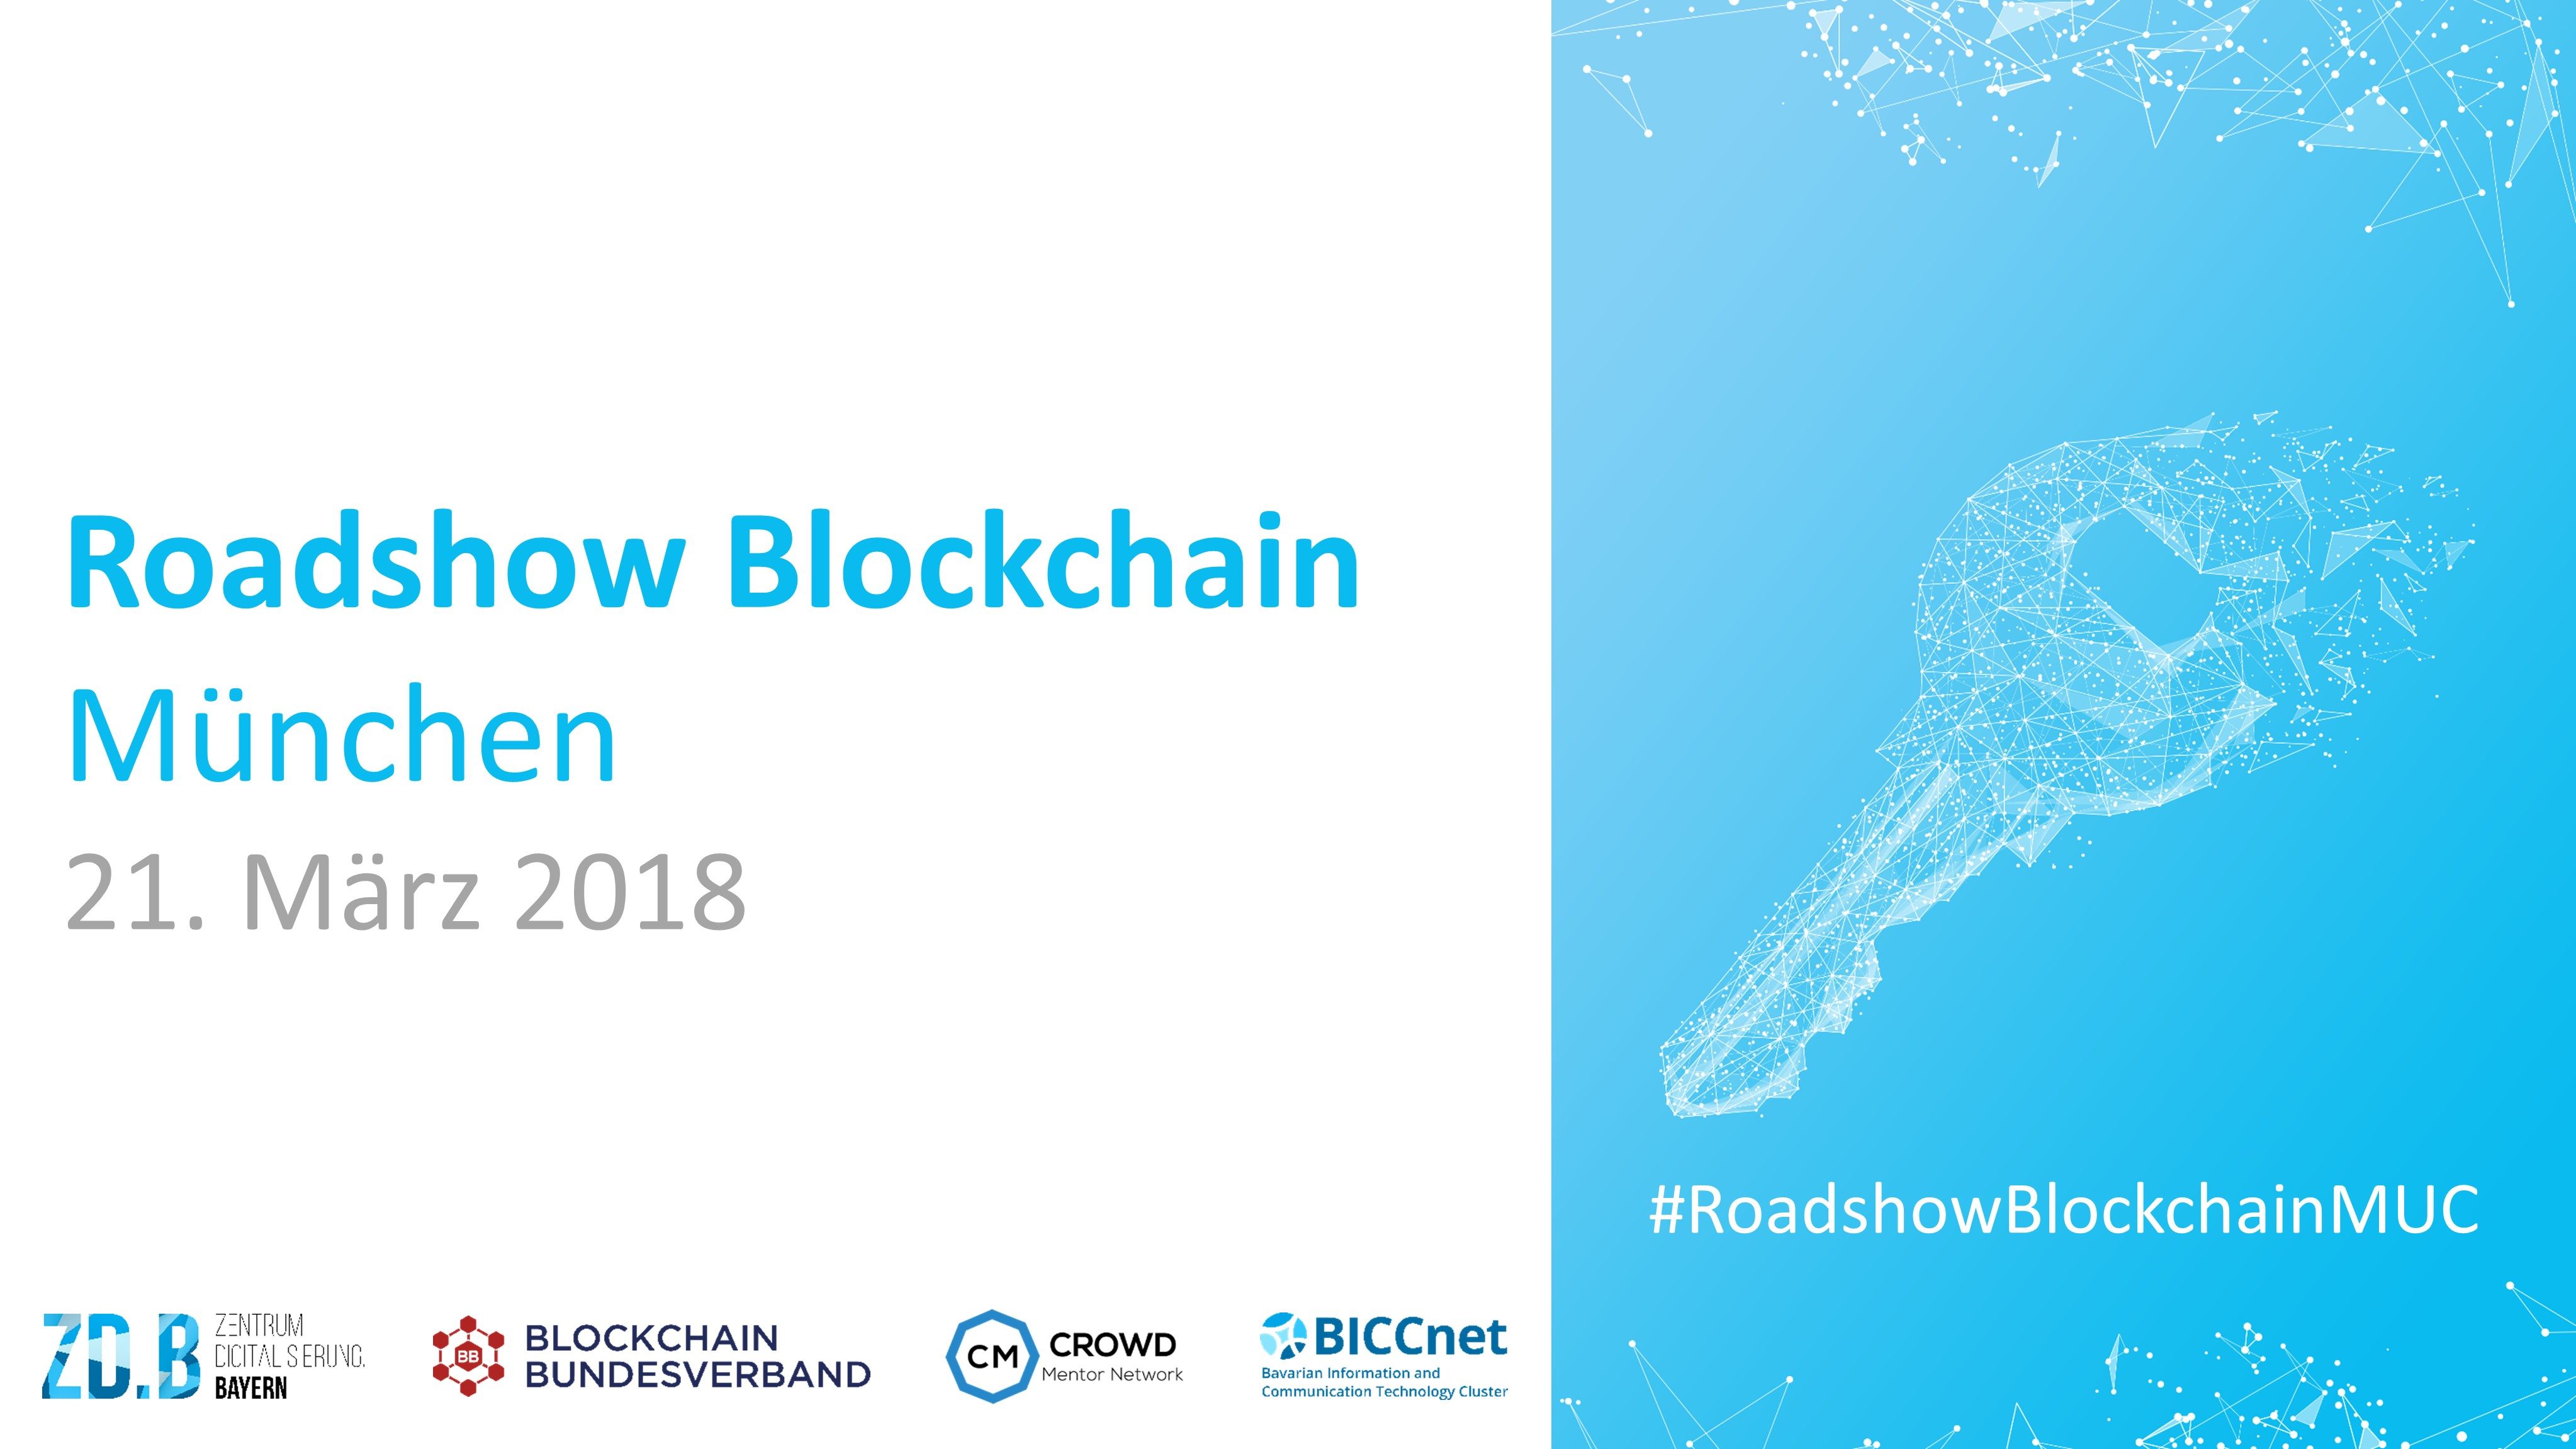 Roadshow Blockchain München - Titelbild